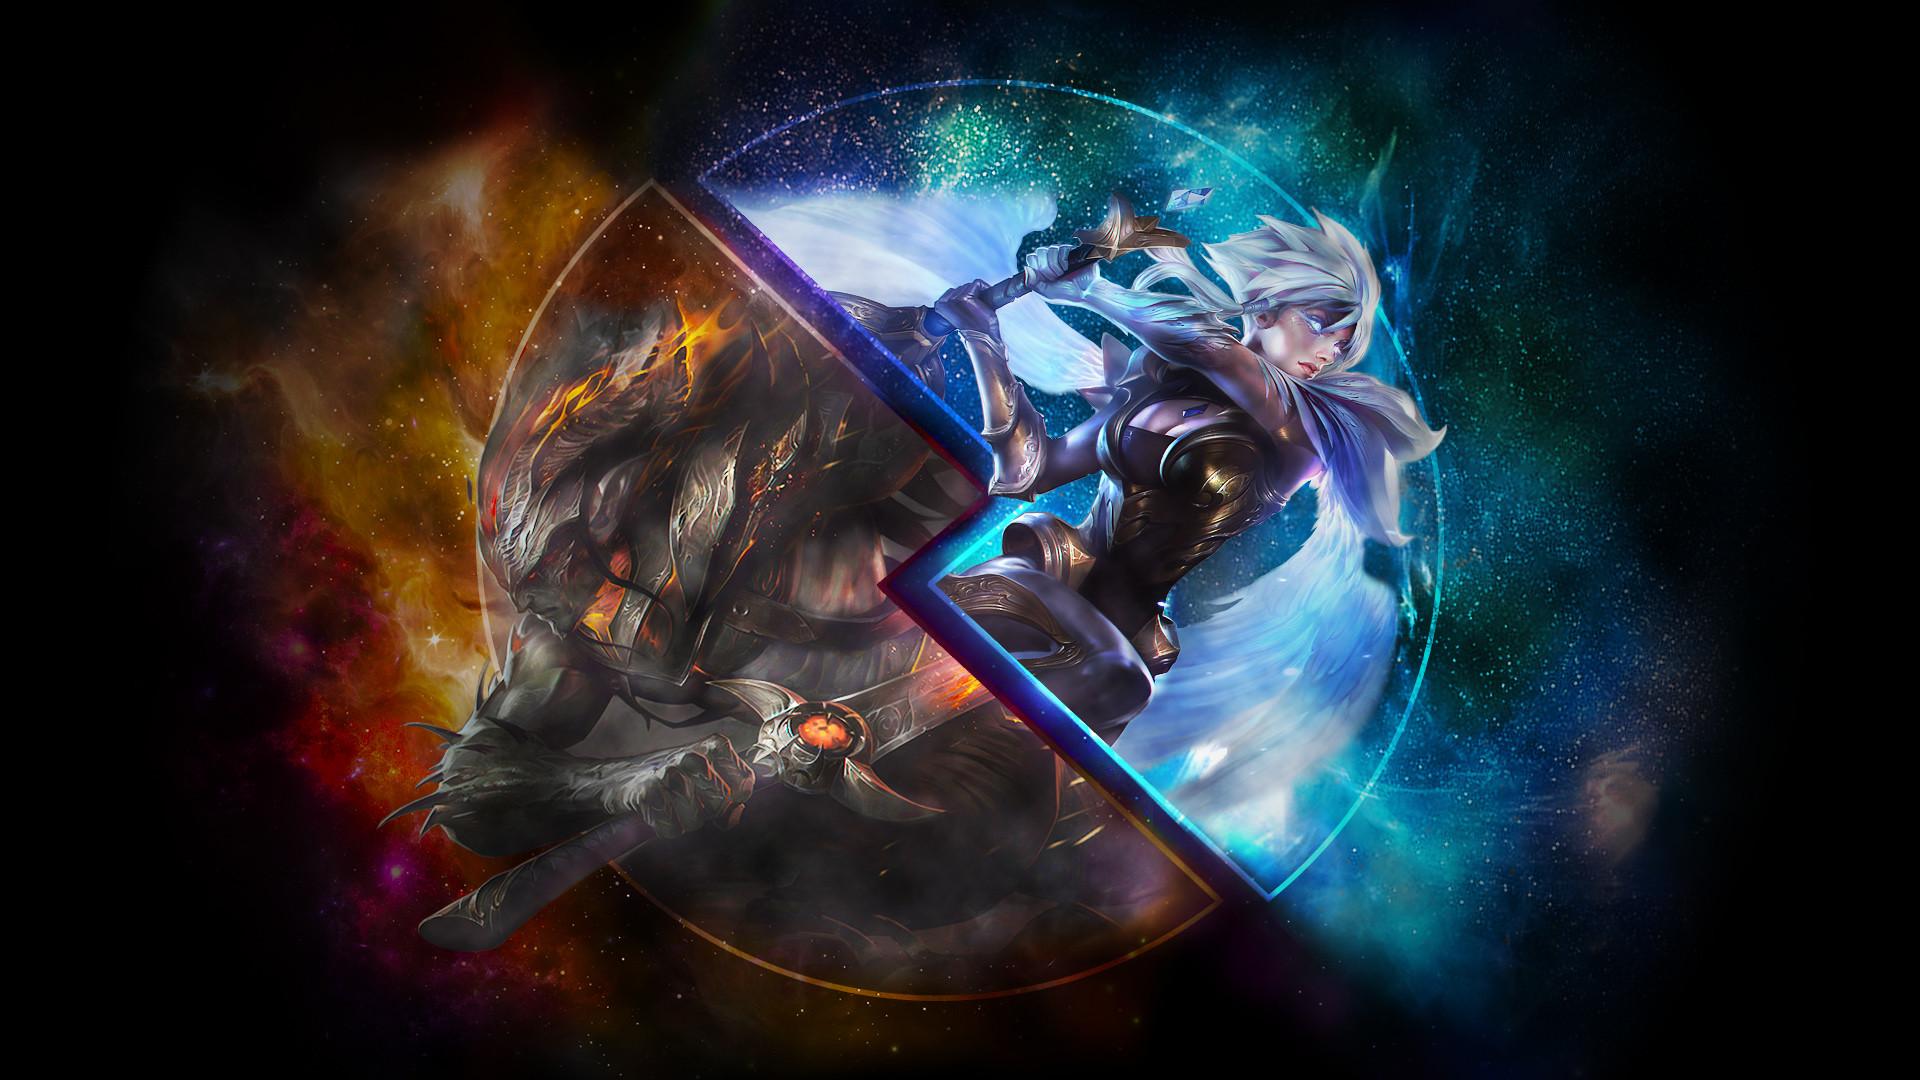 Dawnbringer Riven & Nightbringer Yasuo by syraelx HD Wallpaper Background  Fan Art Artwork League of Legends